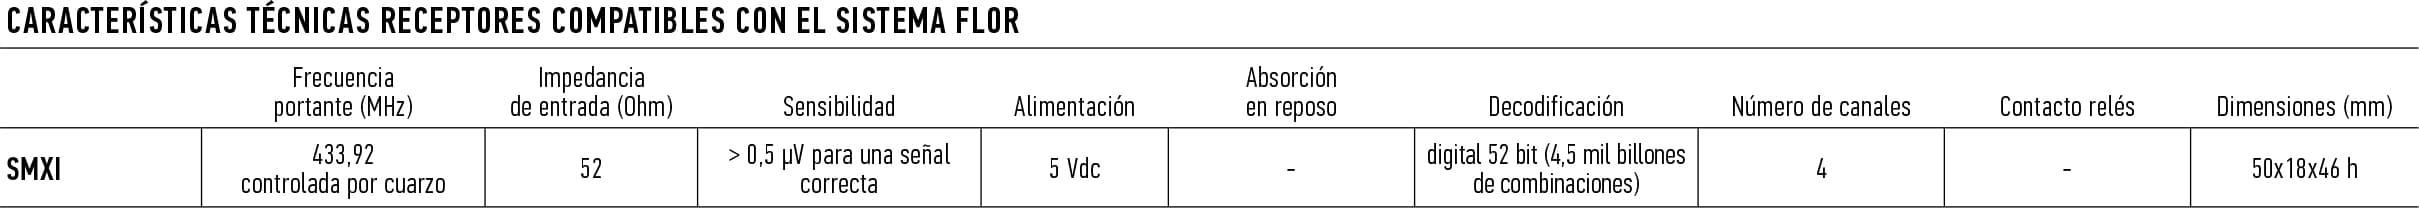 receptores-compatibles-flor